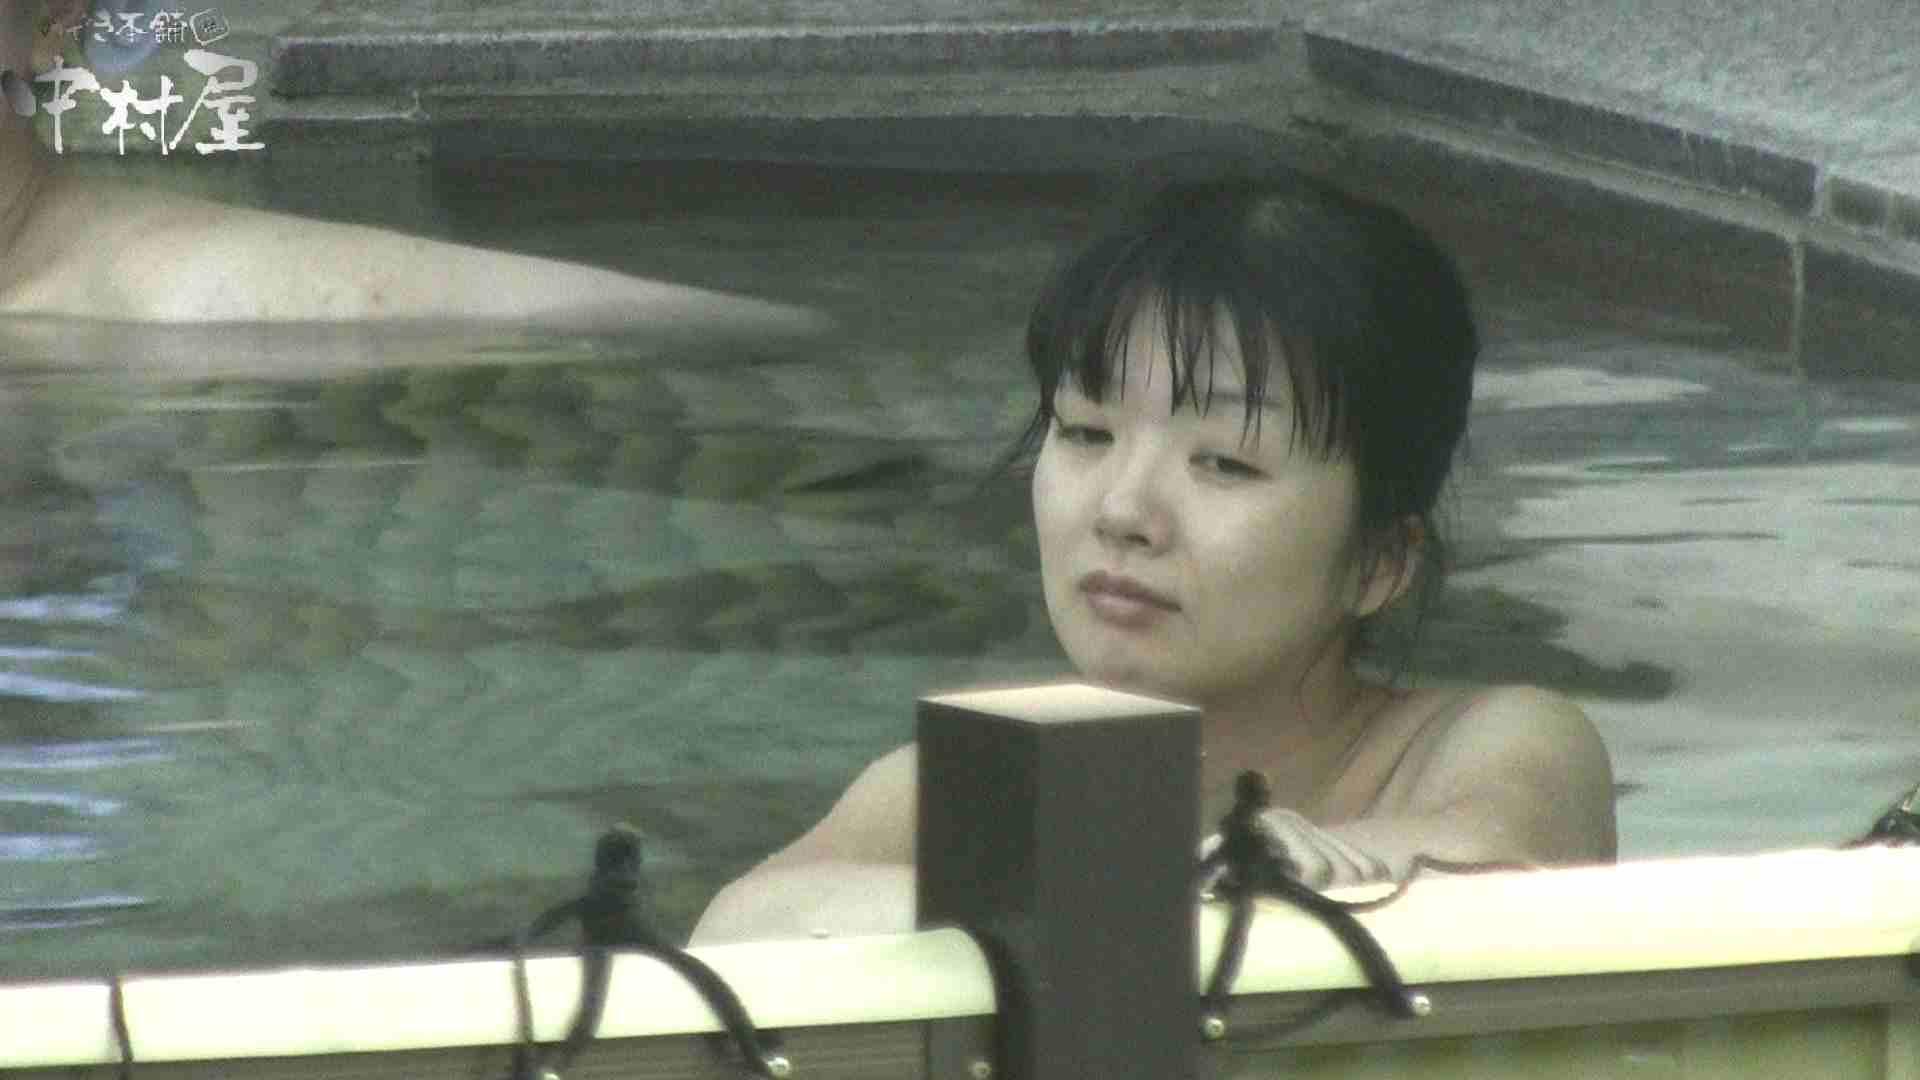 Aquaな露天風呂Vol.904 盗撮師作品 | 露天風呂突入  103pic 46